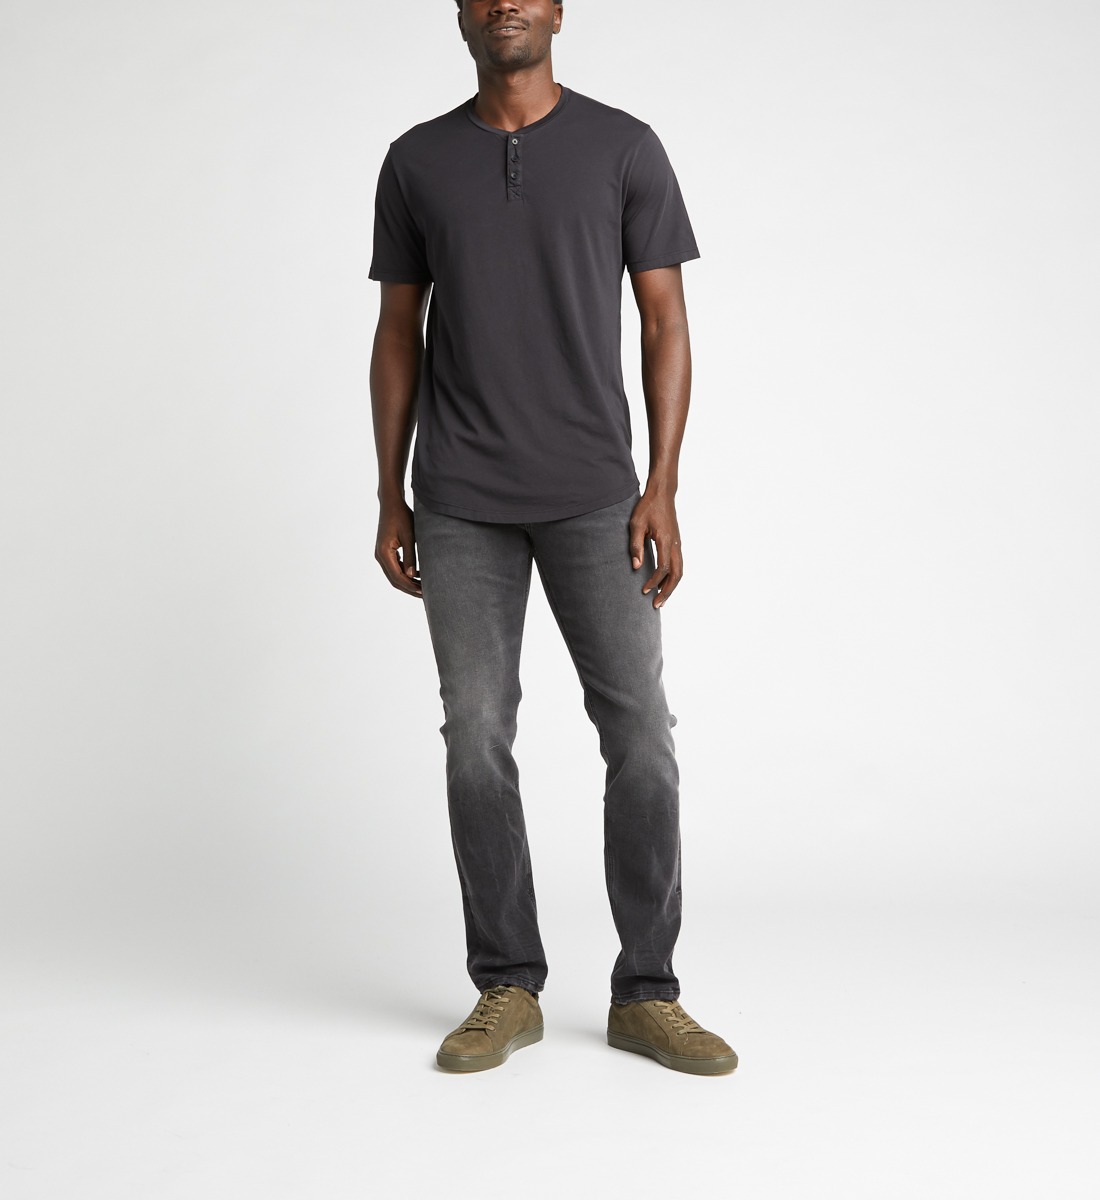 Silver Jeans Konrad Slim Fit Slim Leg Jeans